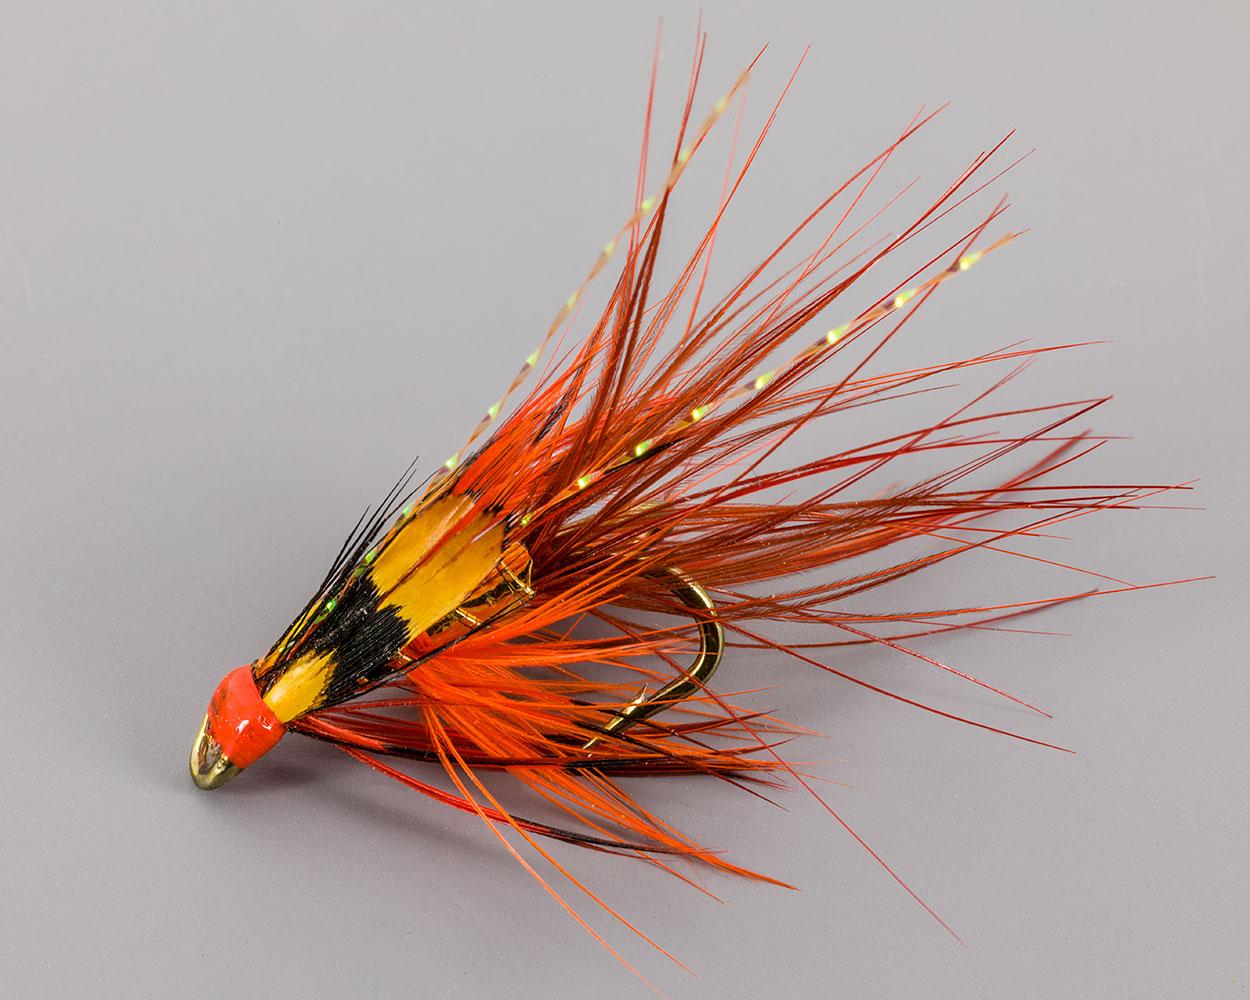 Shrimp07Dec18_7971.jpg